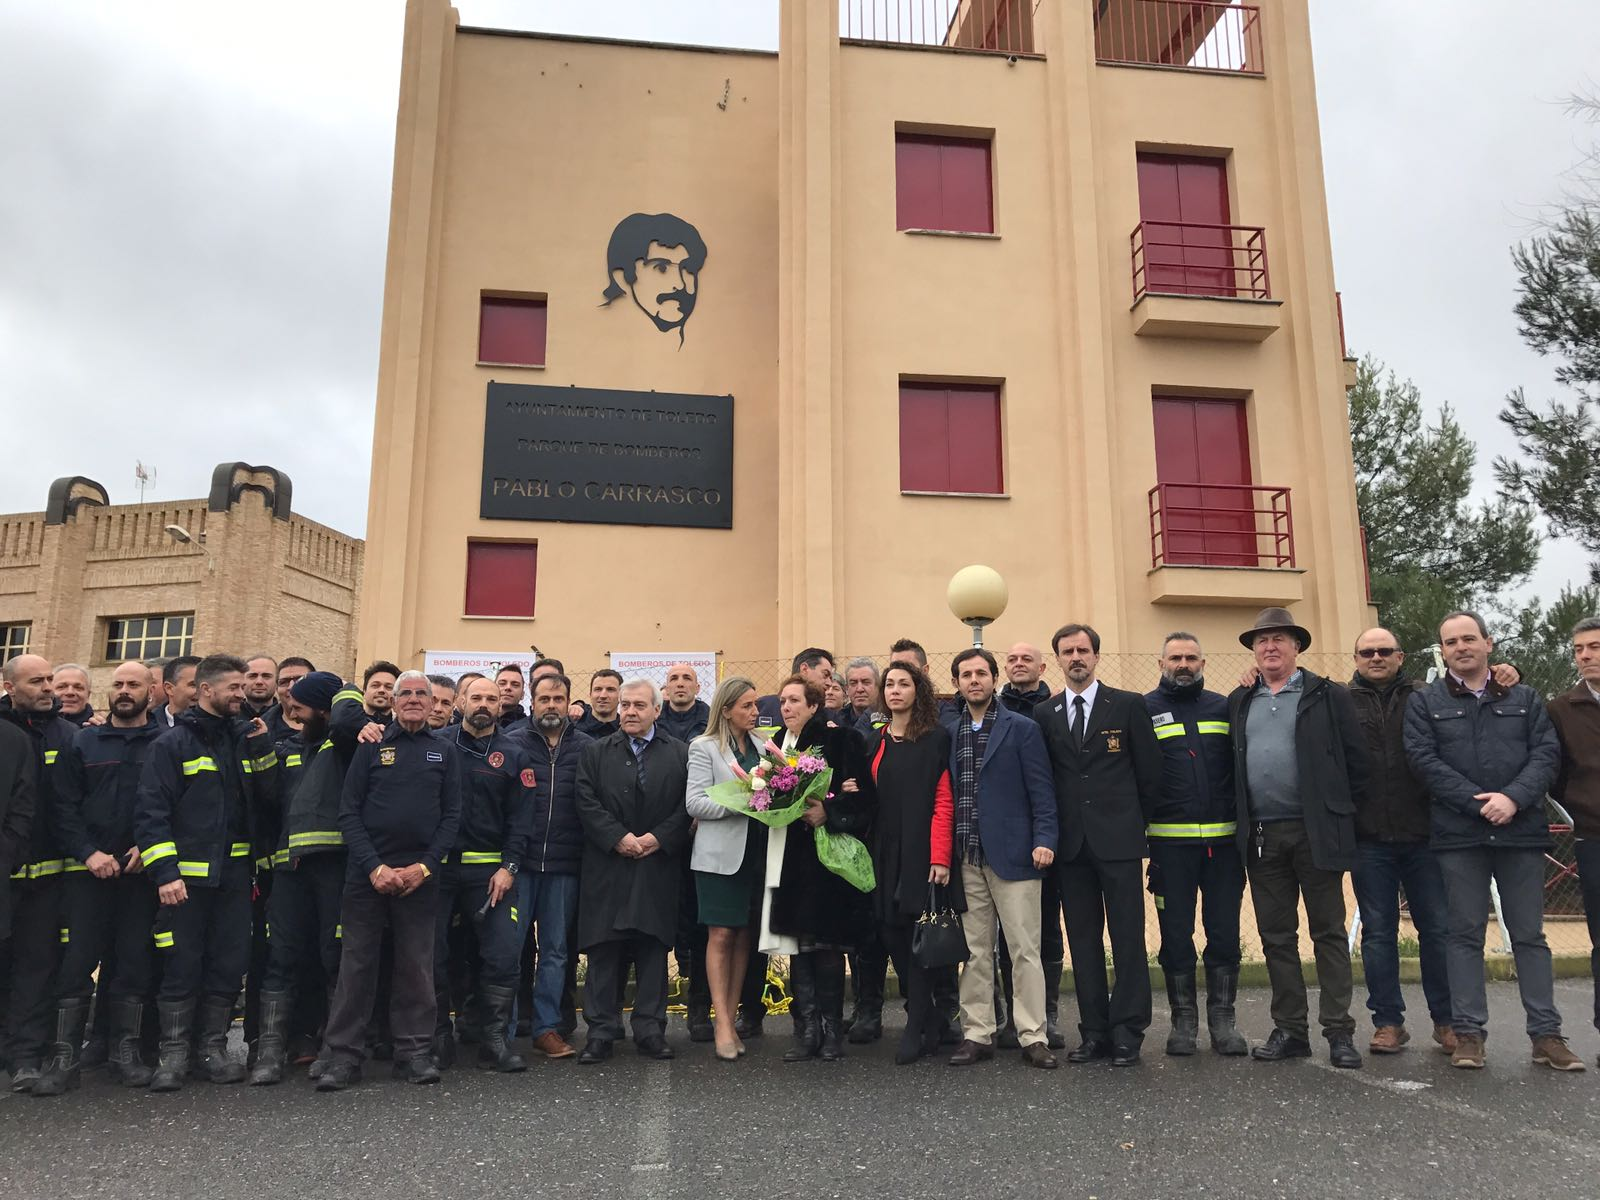 Homenaje a Pablo Carrasco. 30 años. Parque de Bomberos de Toledo